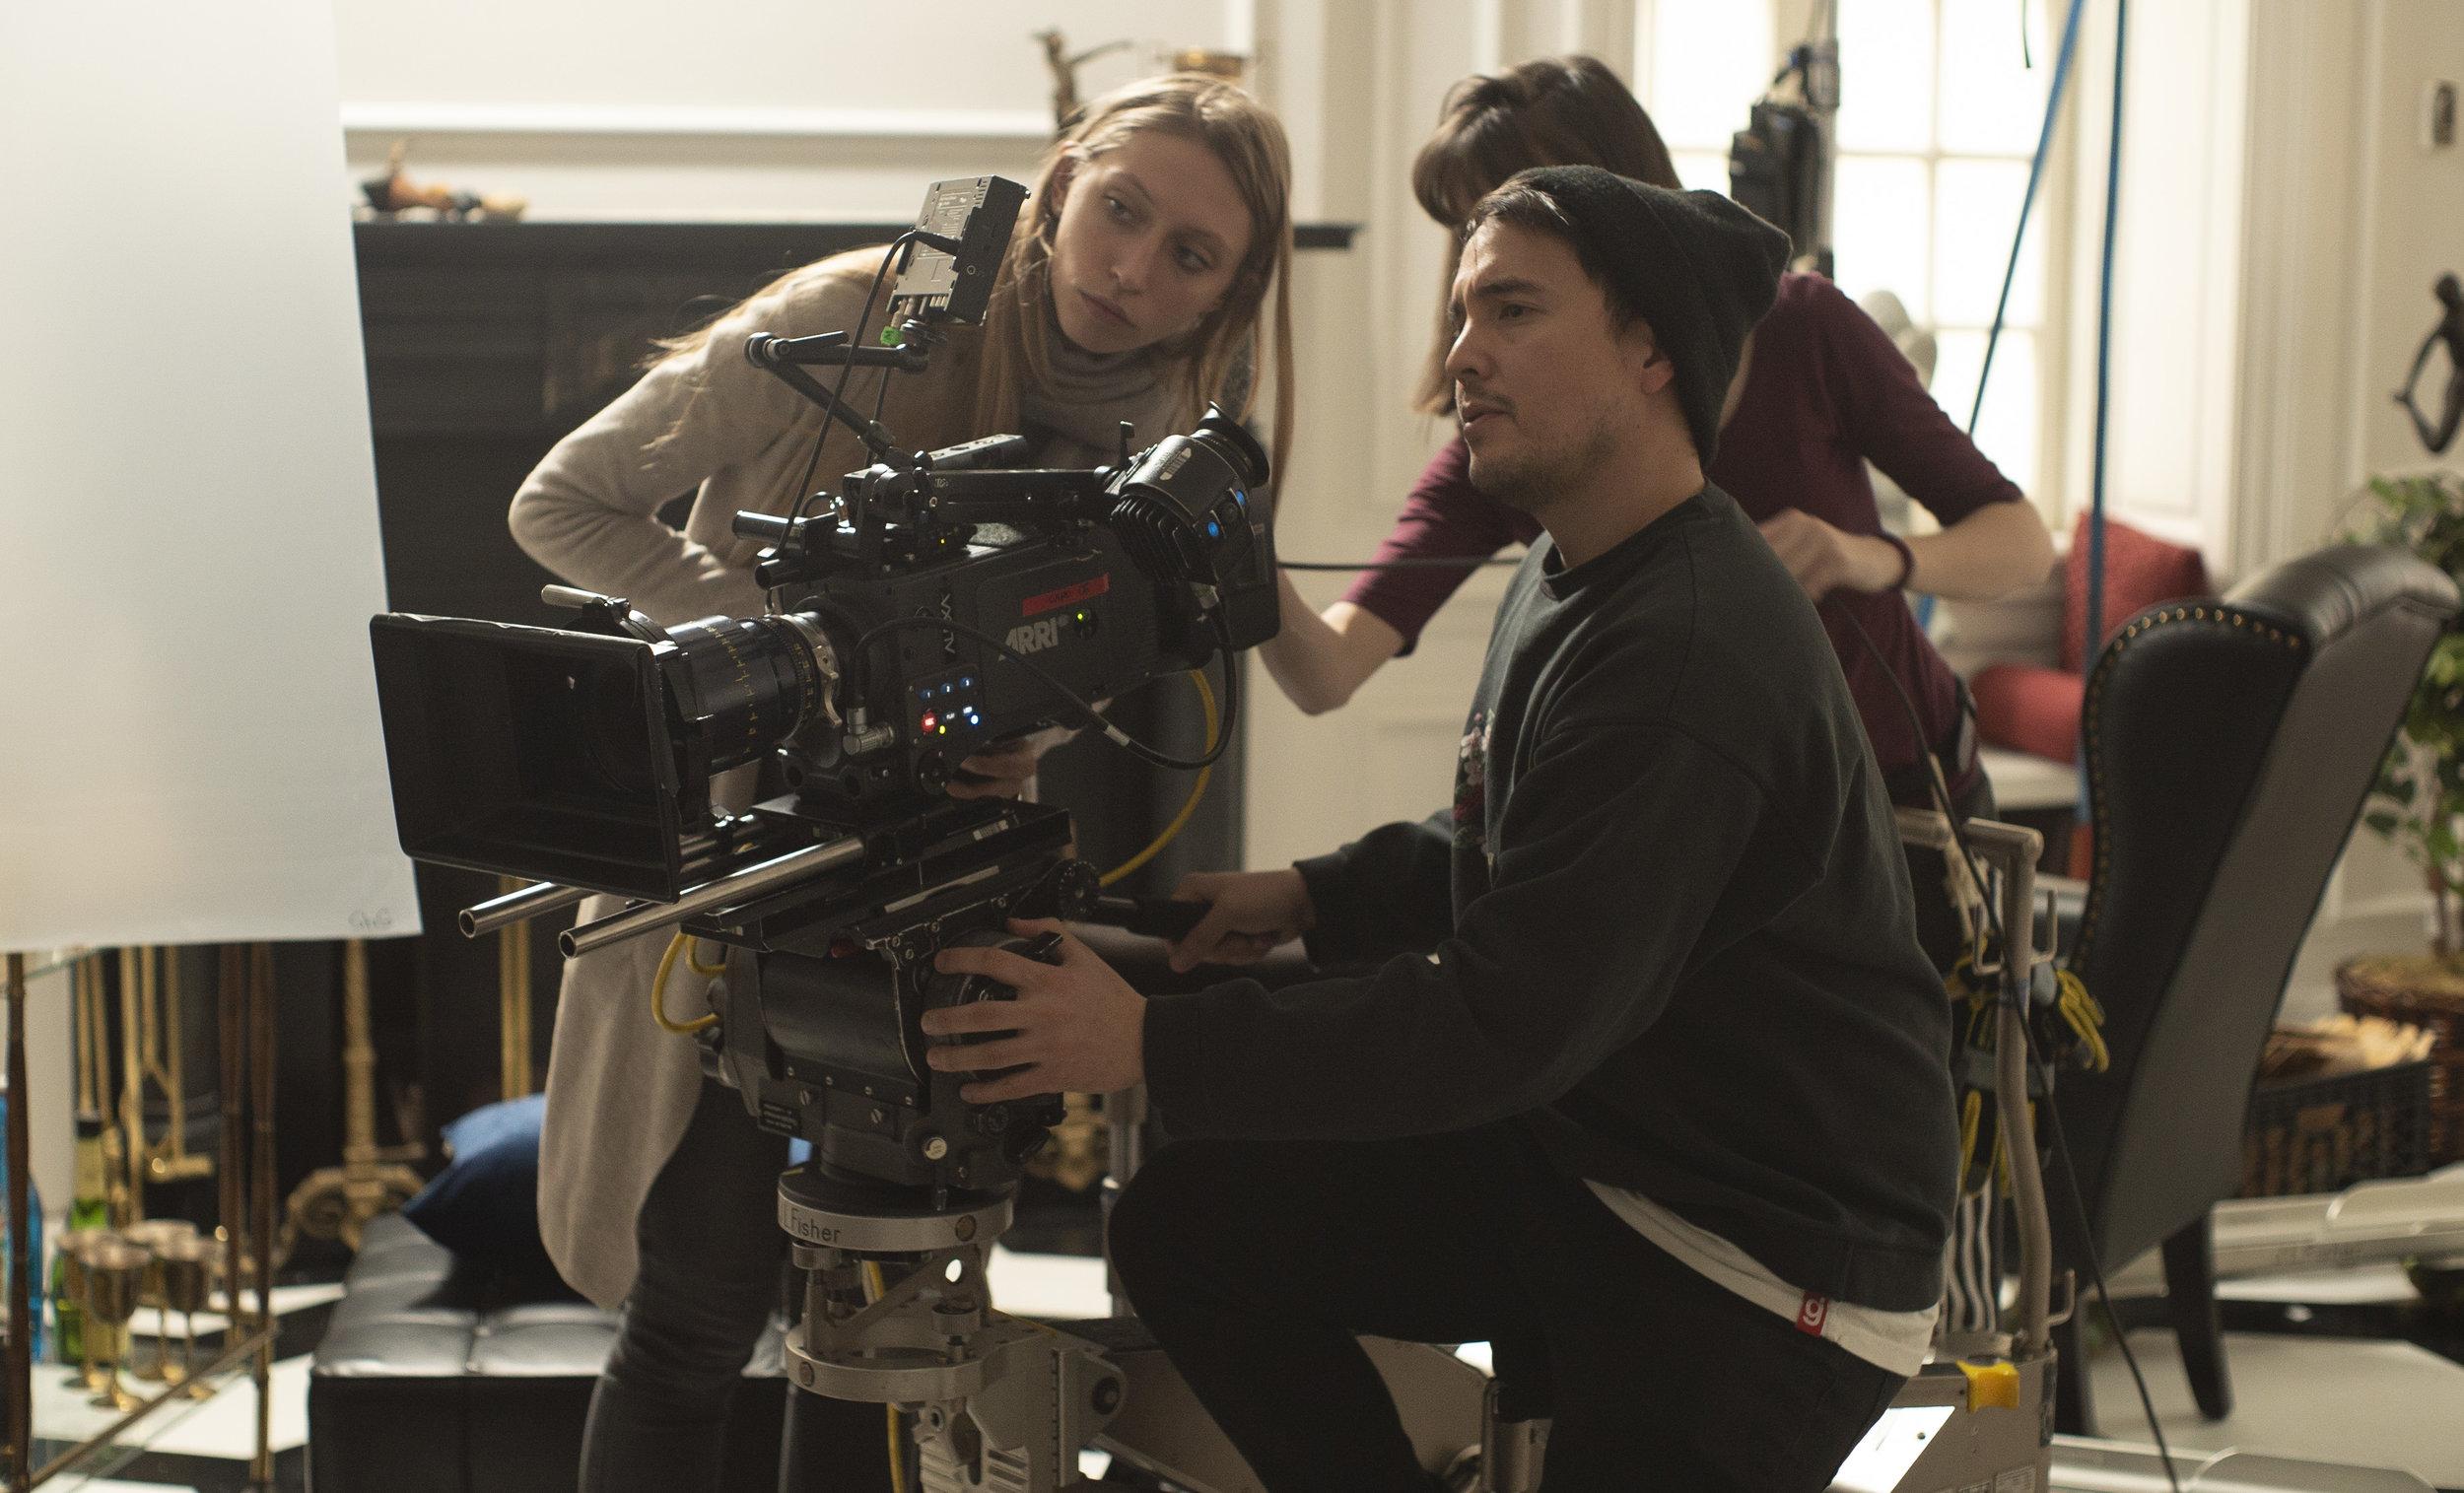 Camera team working on Joseph Longo's set in USA